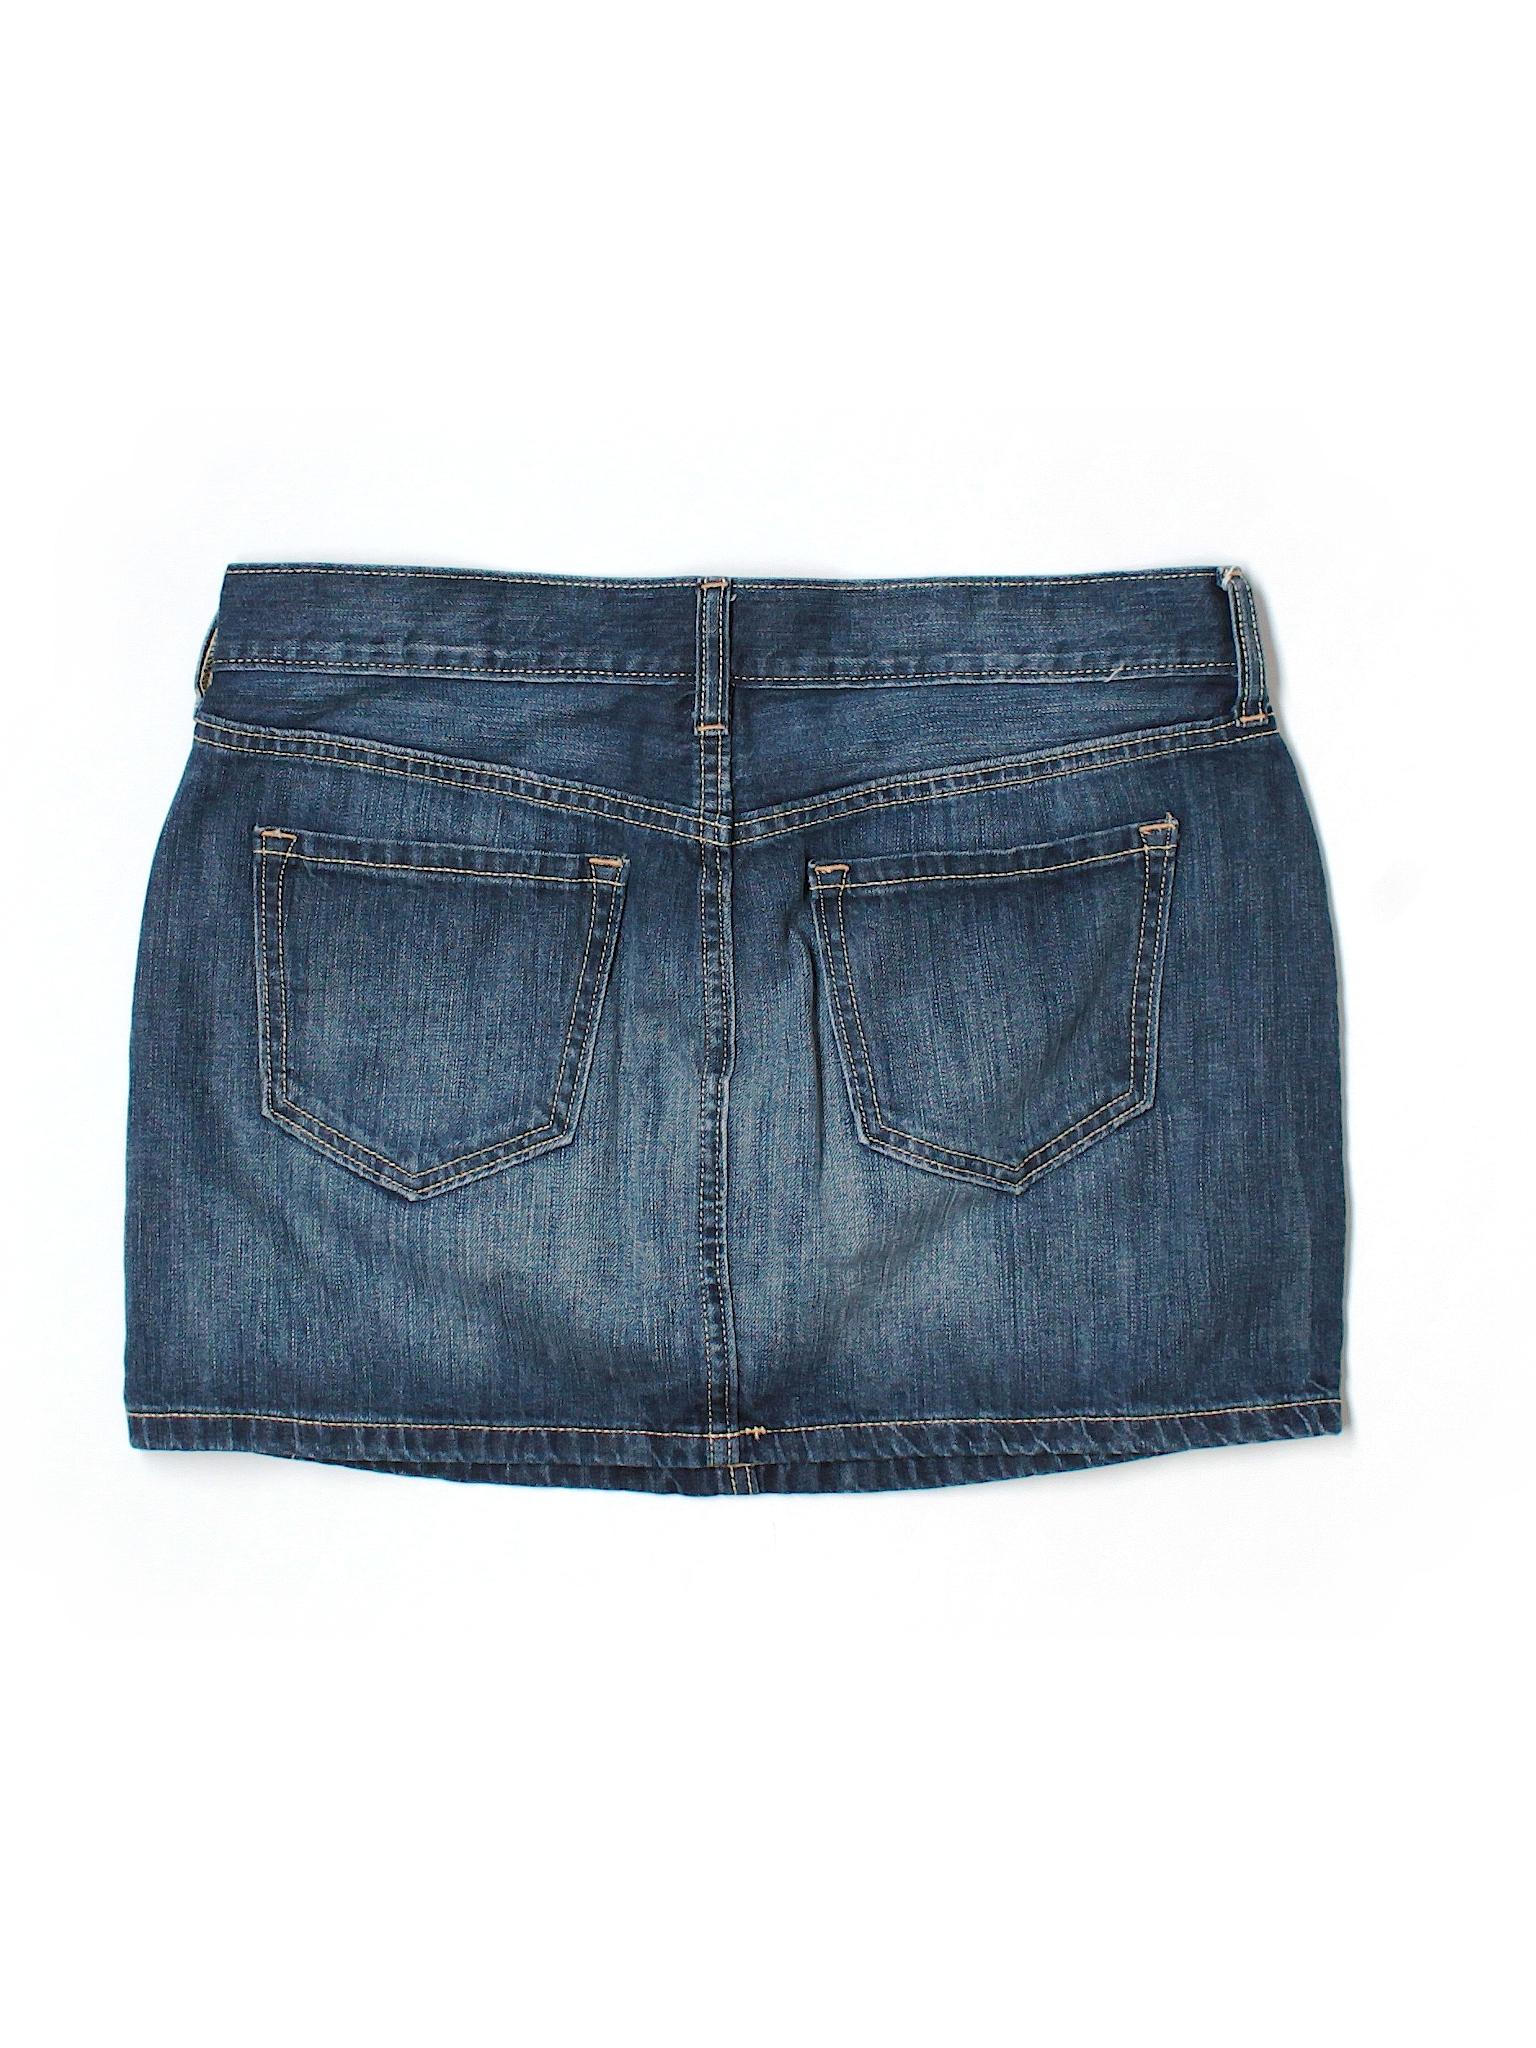 Boutique Denim Boutique Denim Skirt Skirt pxZqPH